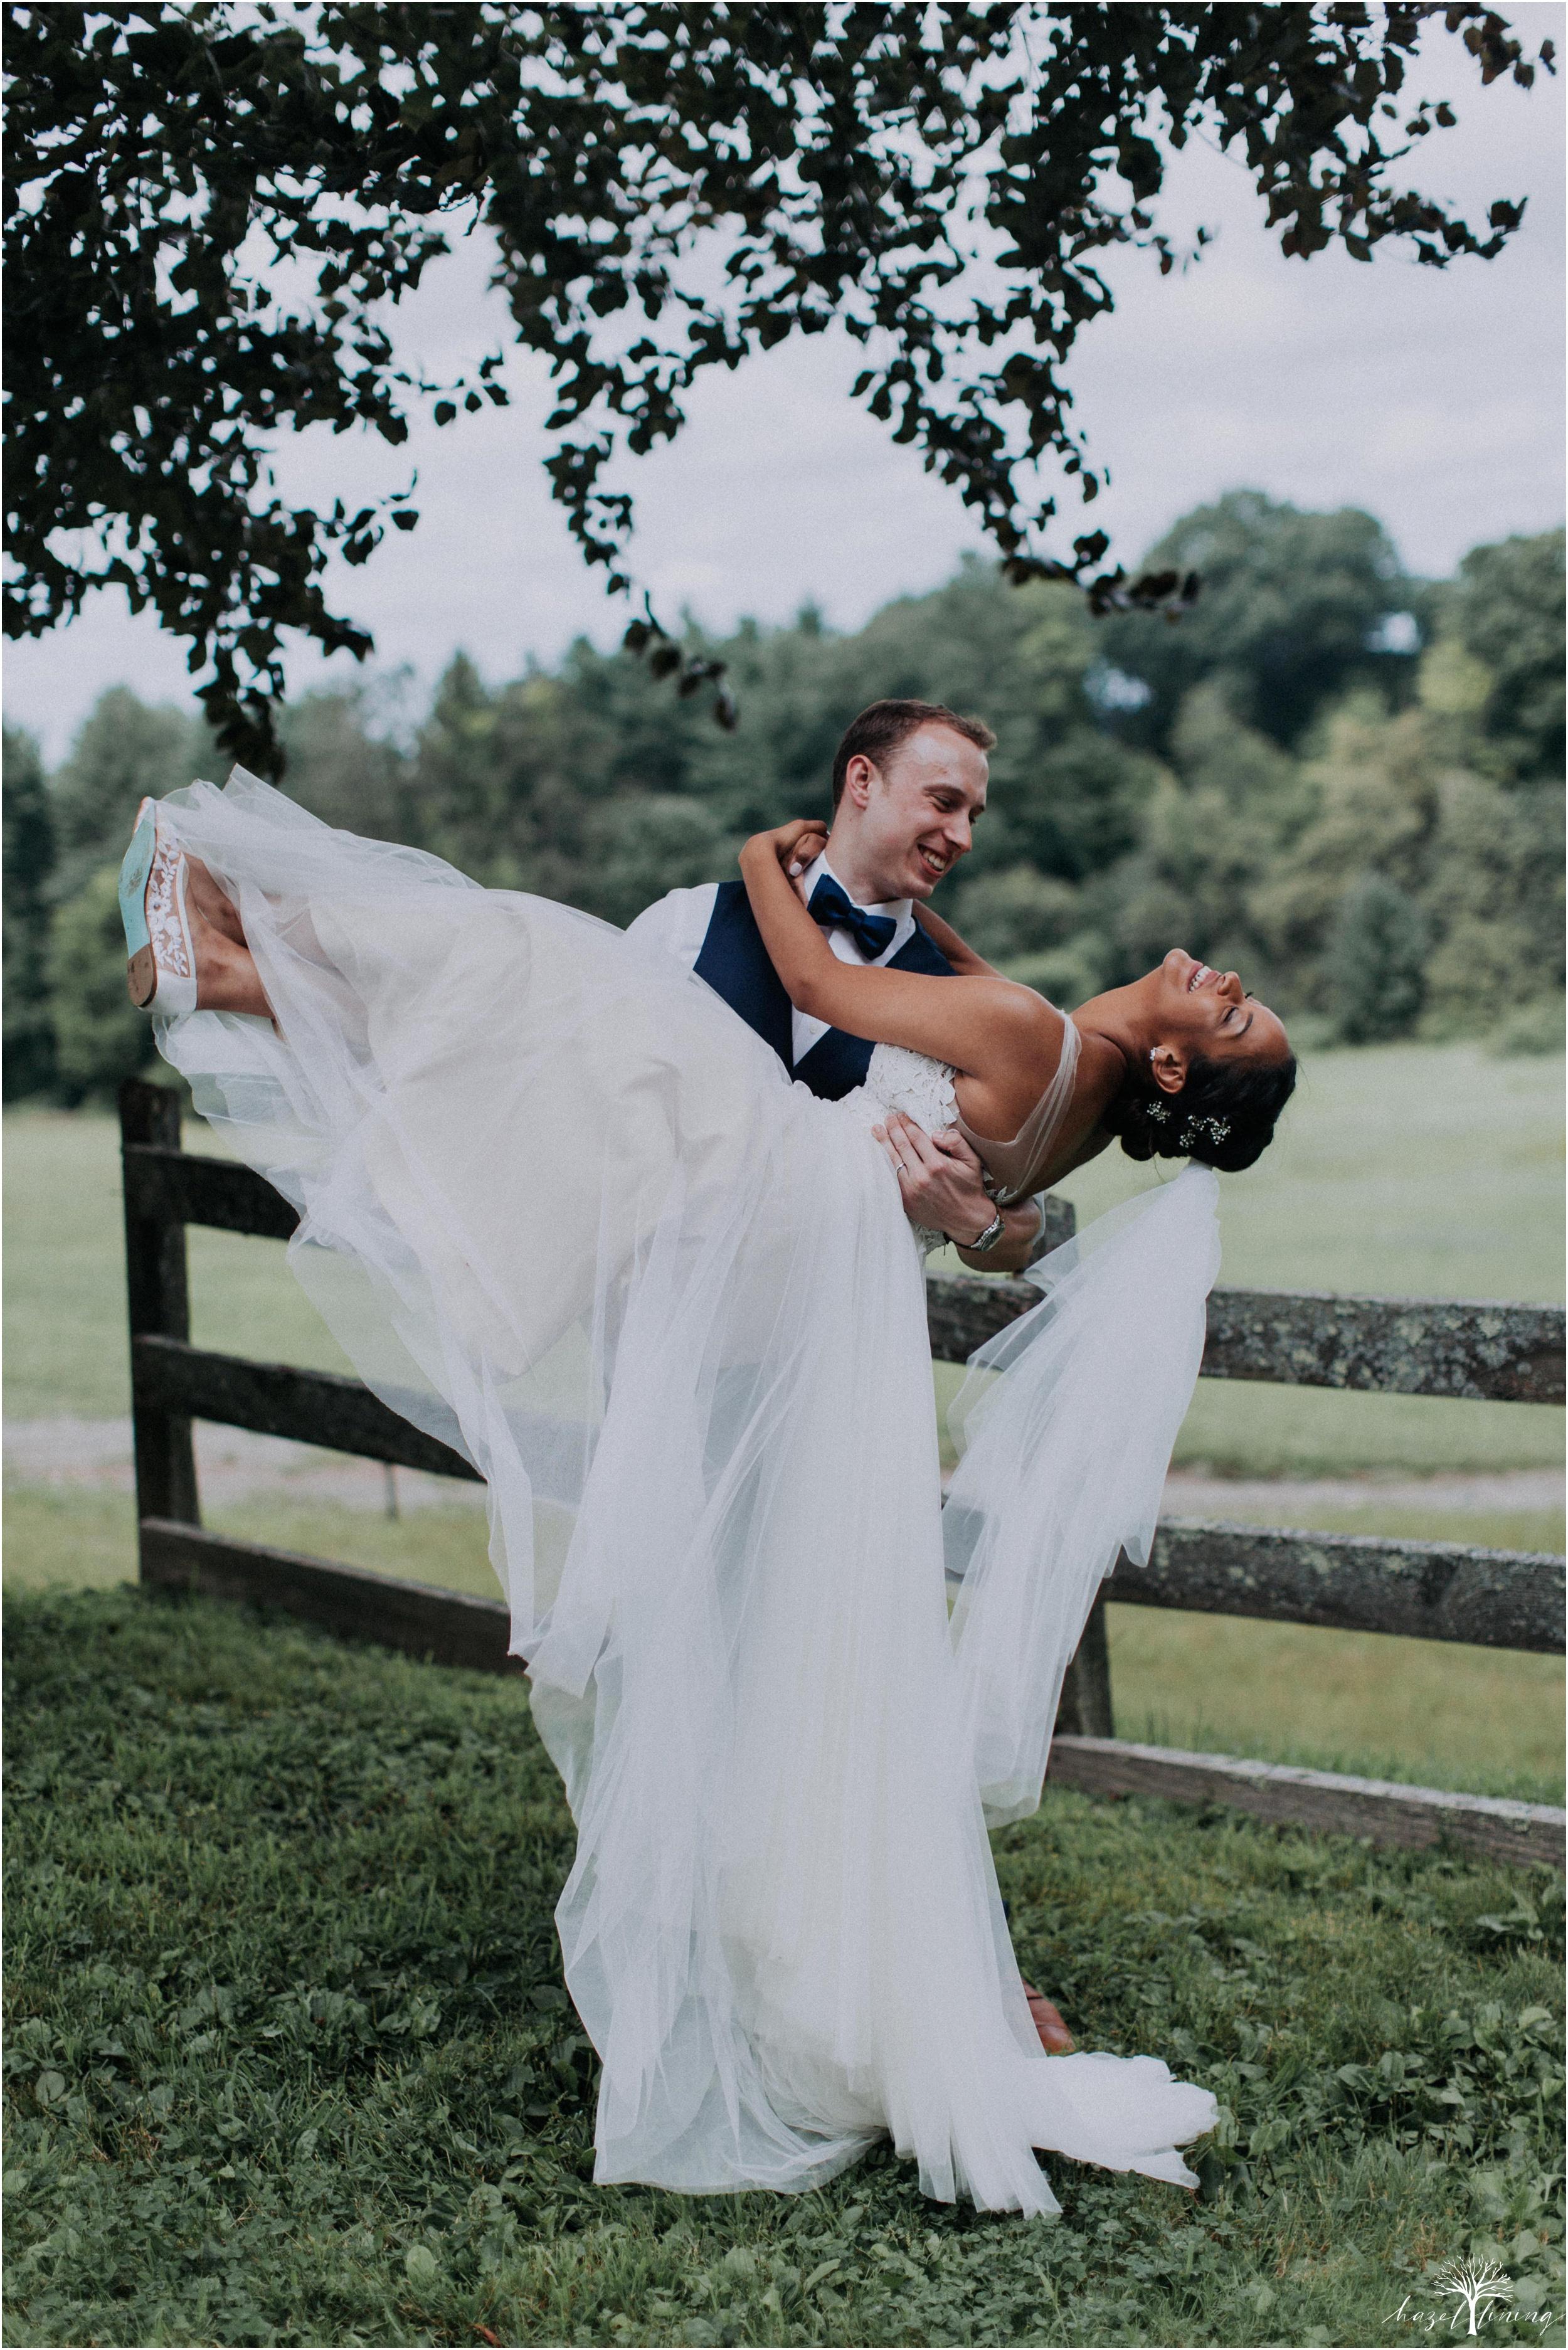 mariah-kreyling-samuel-sherratt-sherrattwiththeworld-peirce-farm-at-witch-hill-boston-massachusetts-wedding-photography-hazel-lining-travel-wedding-elopement-photography_0150.jpg